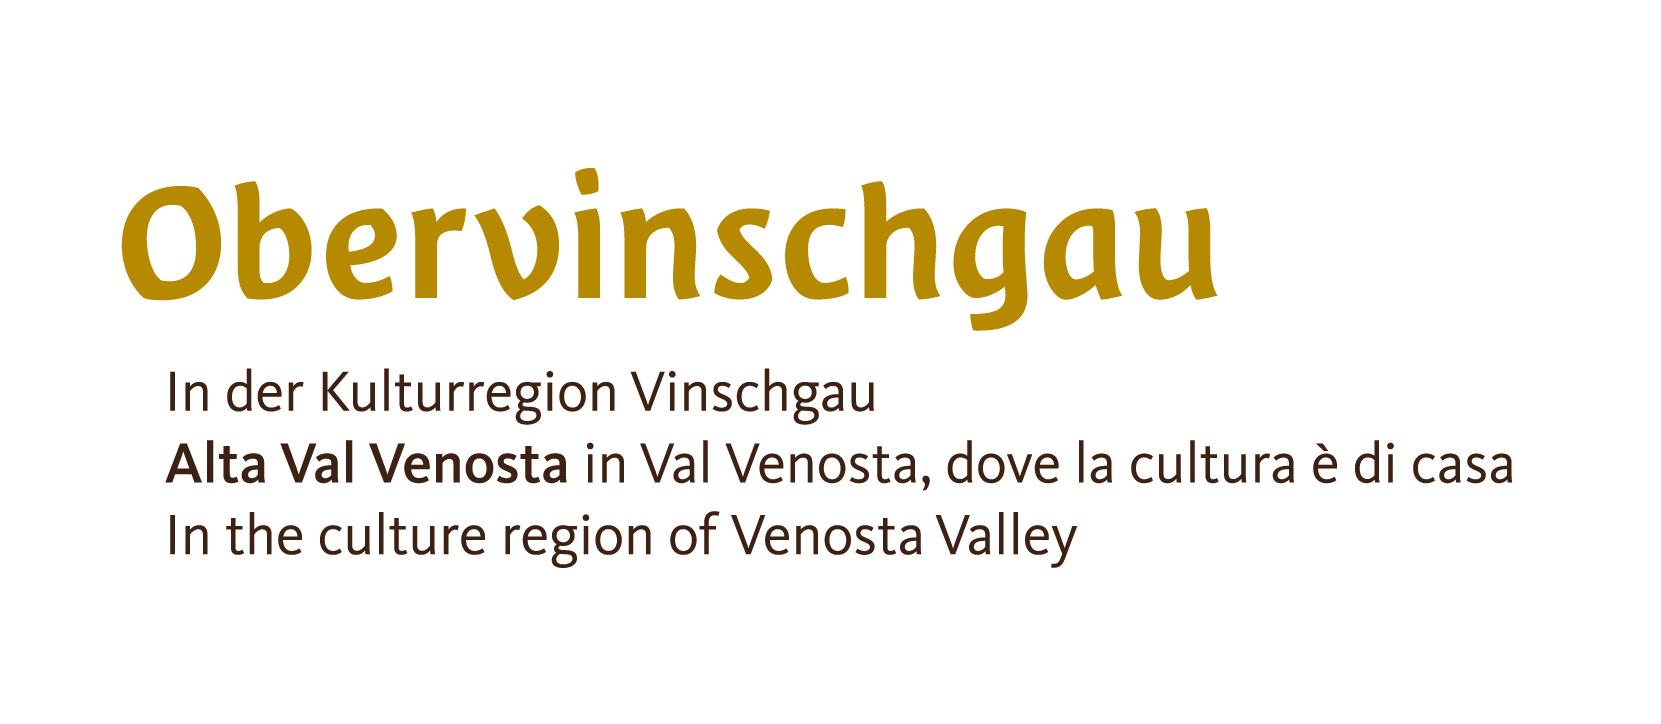 Alta Val Venosta